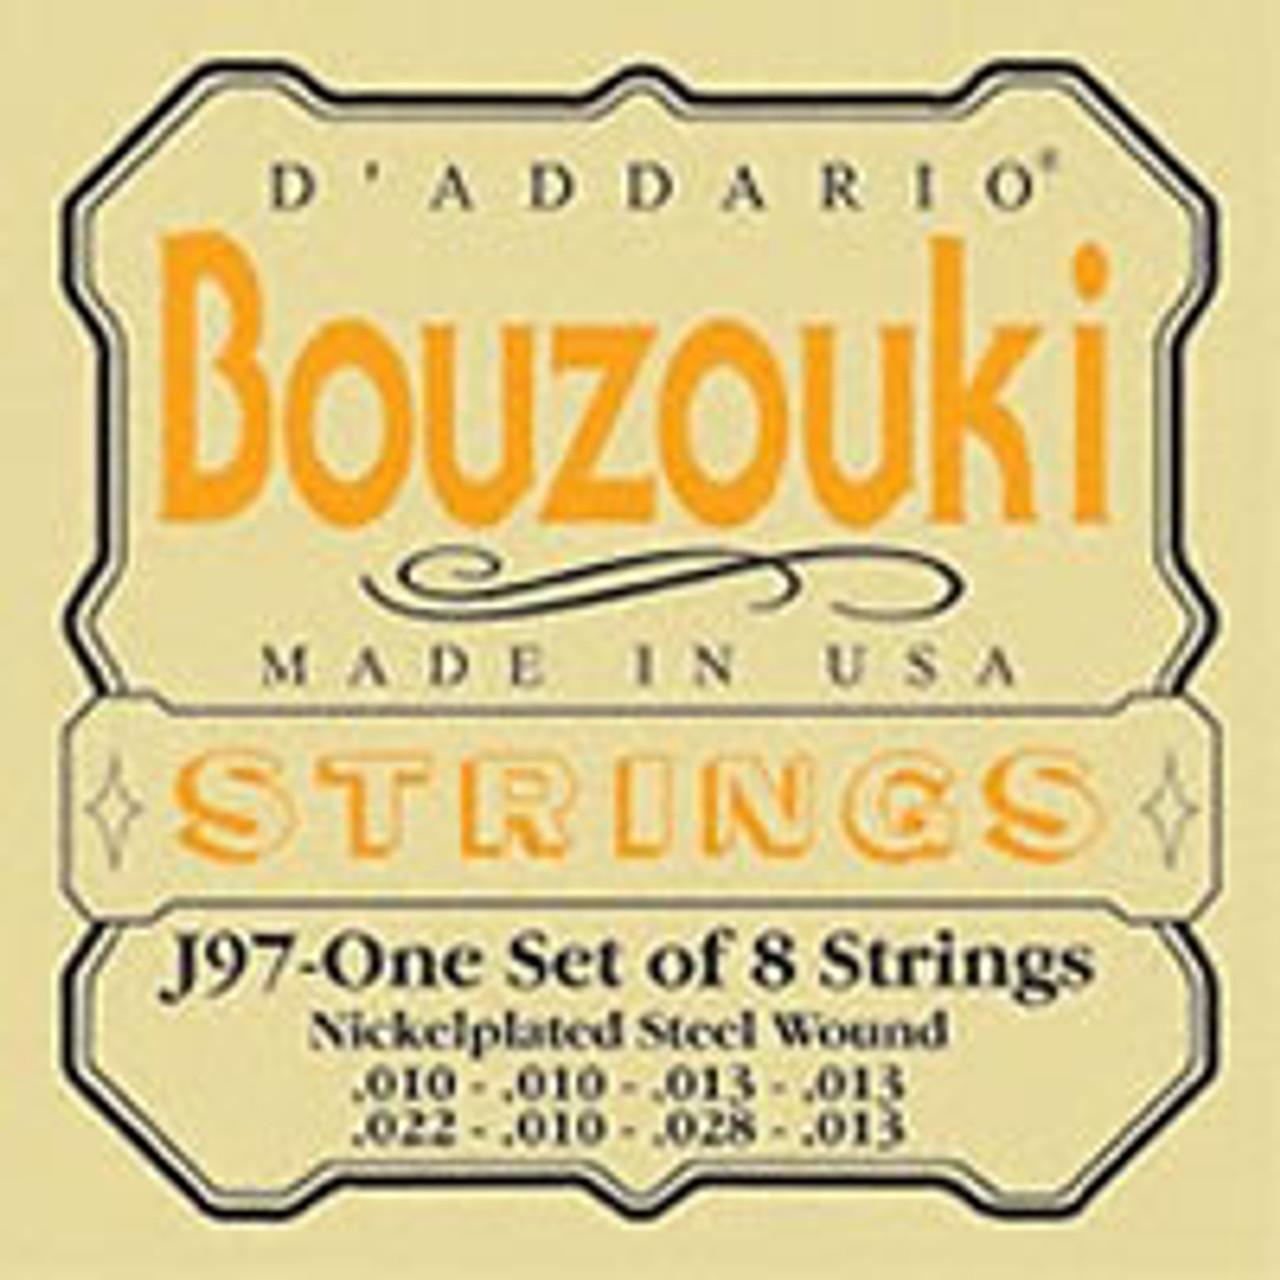 D'addario J97 Nickel Strings for Bouzouki